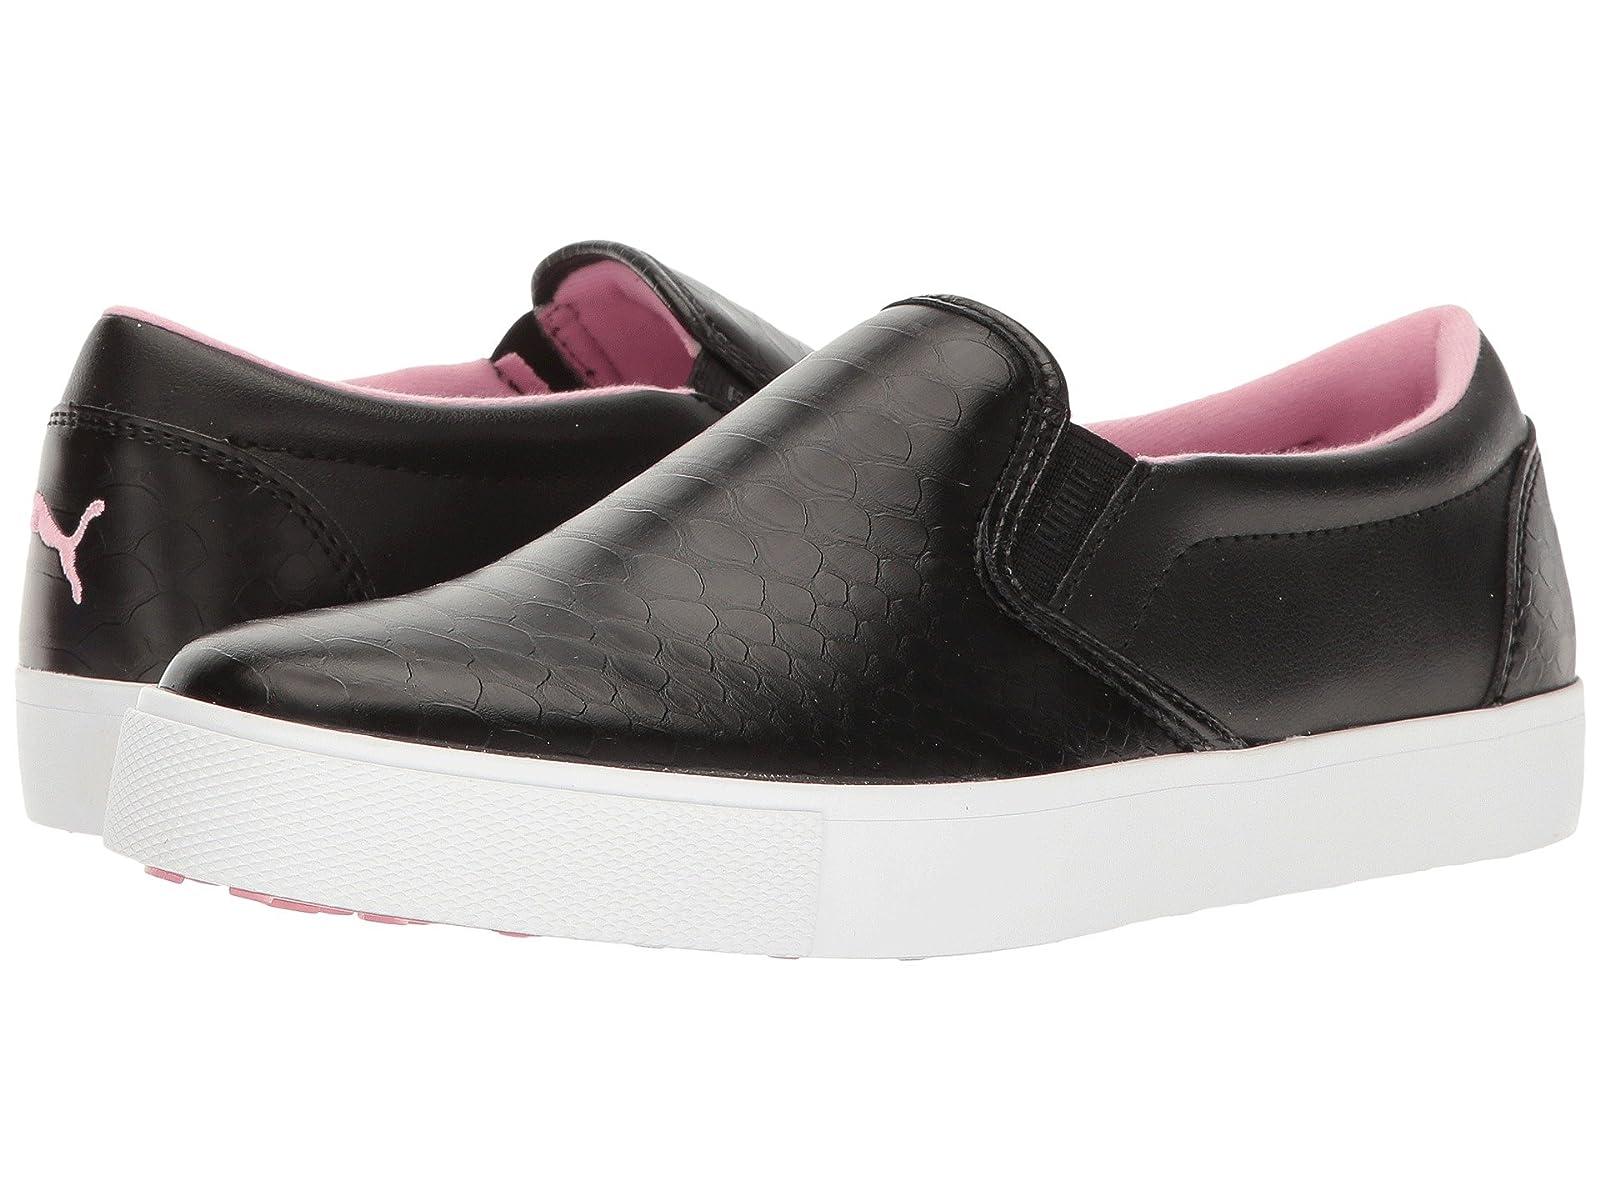 PUMA Golf Tustin Slip-OnAtmospheric grades have affordable shoes